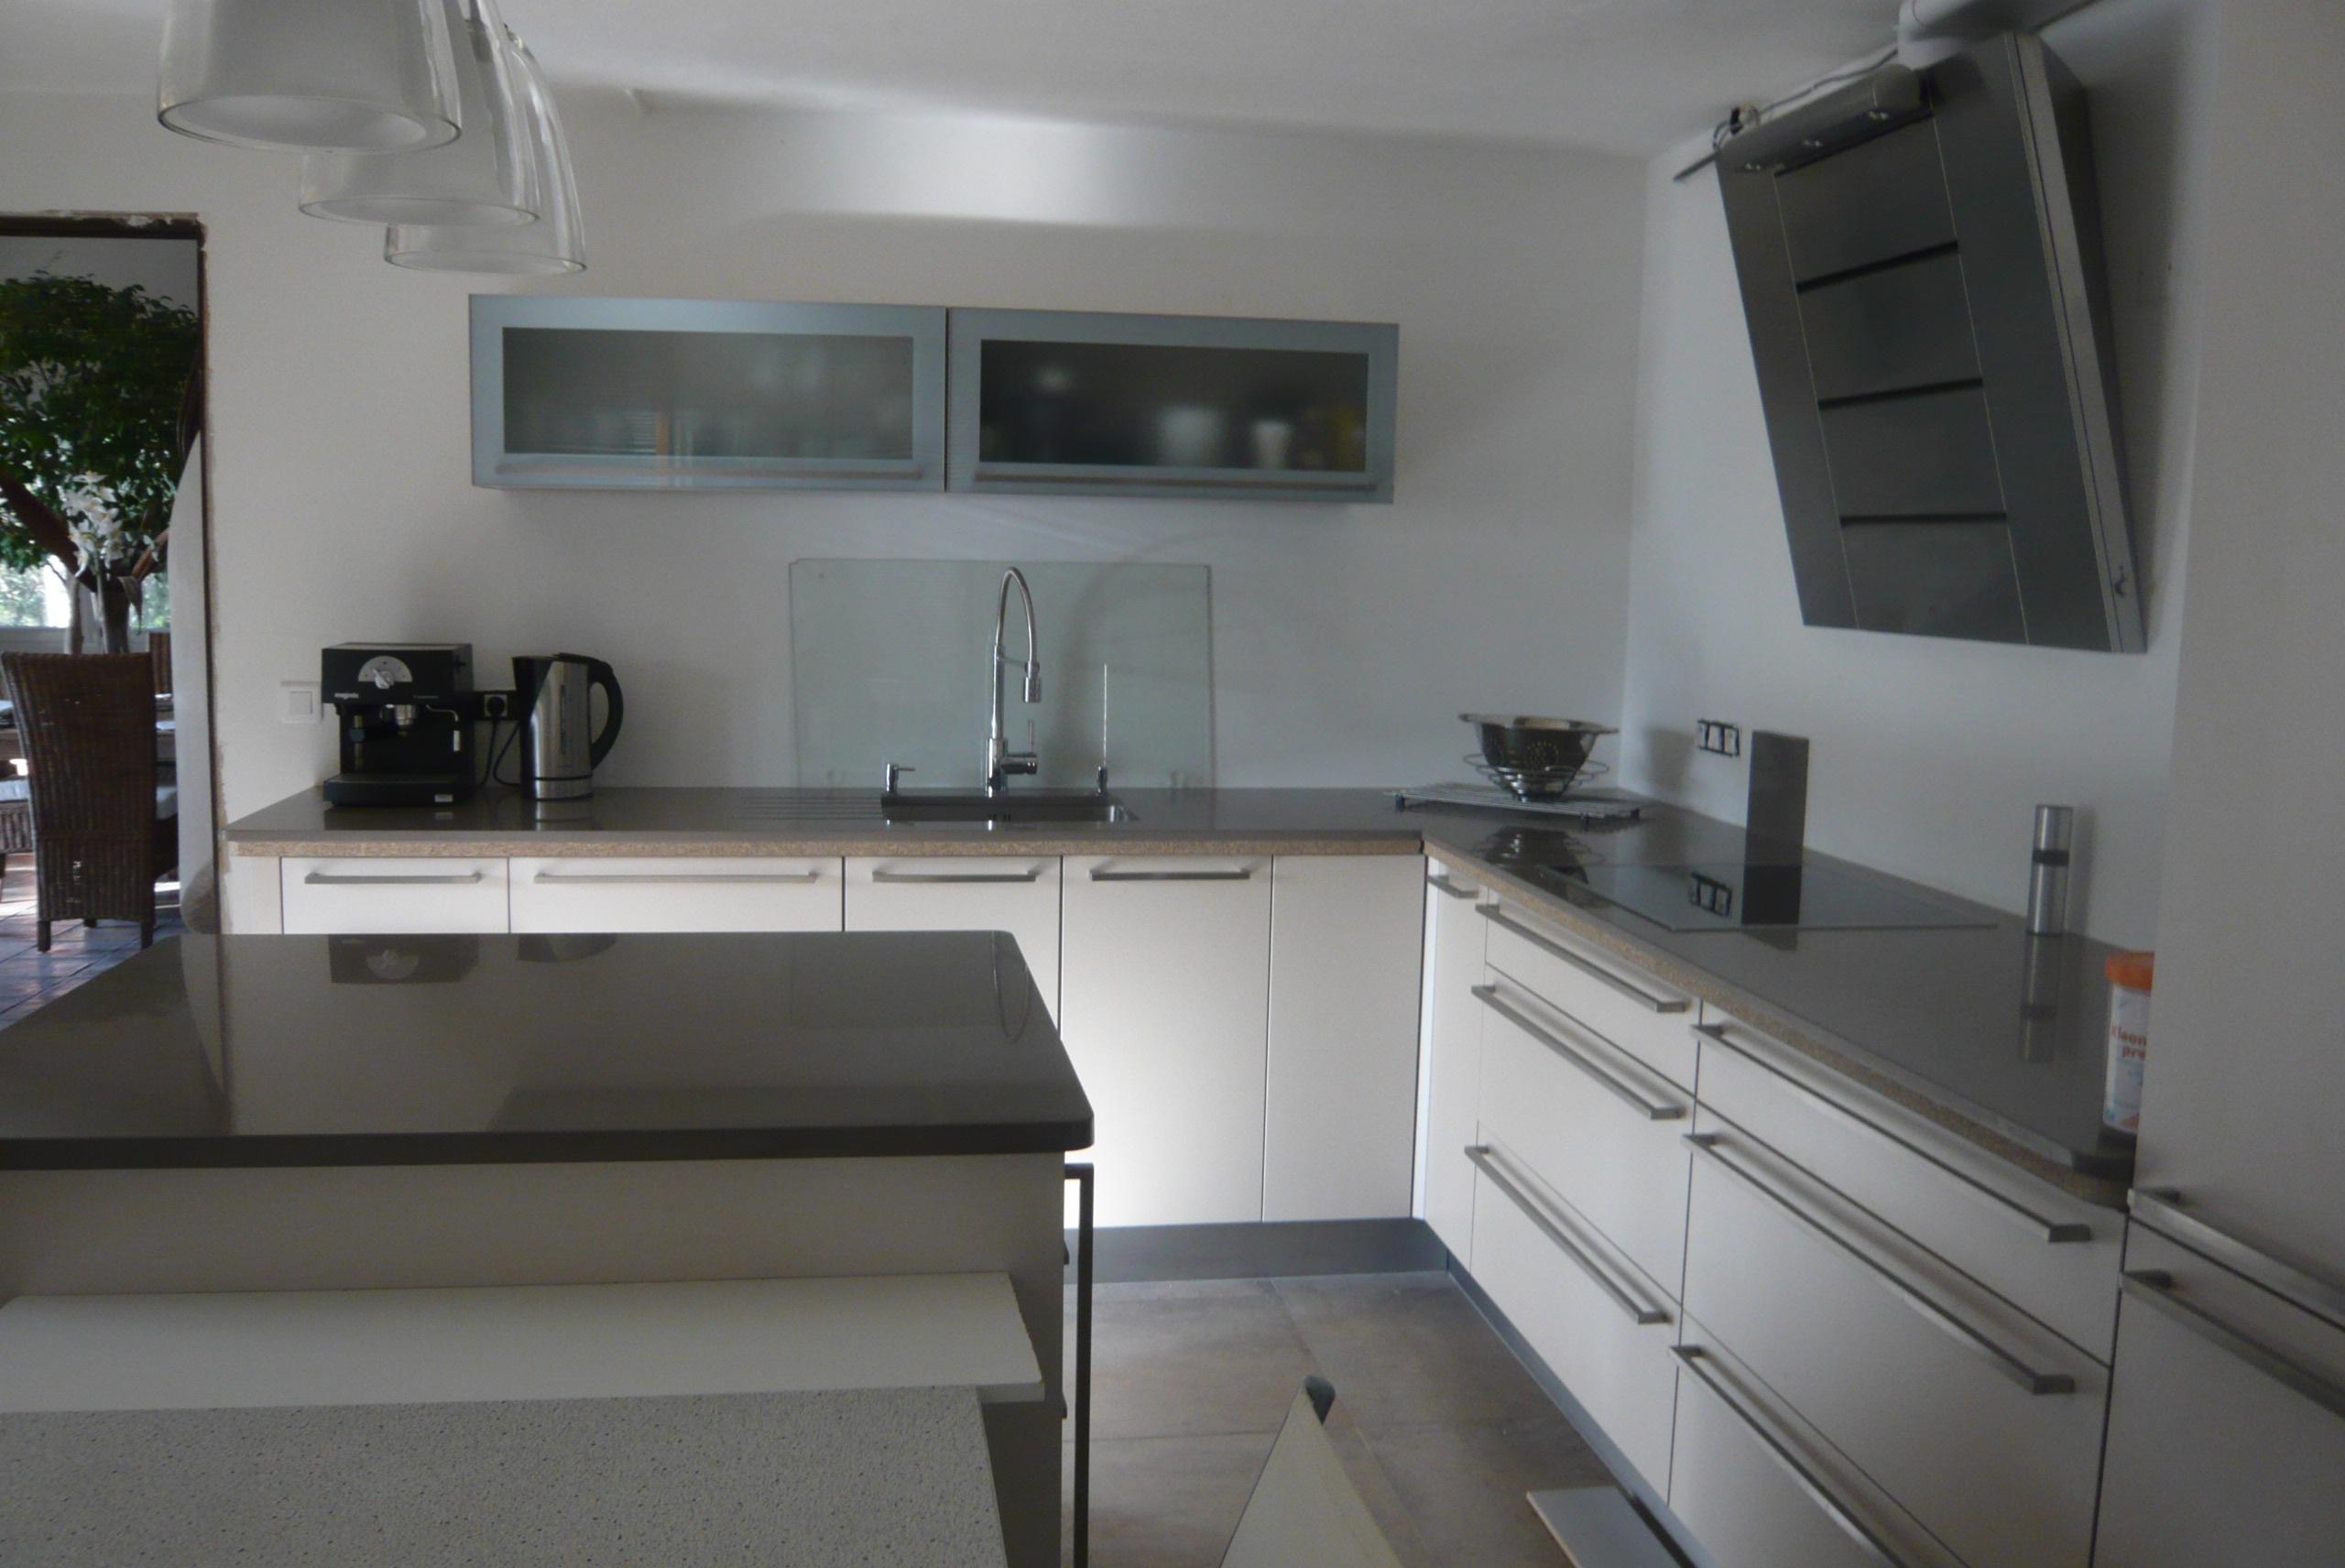 Acheter credence cuisine verre id e pour cuisine - Credence en verre pour cuisine ...